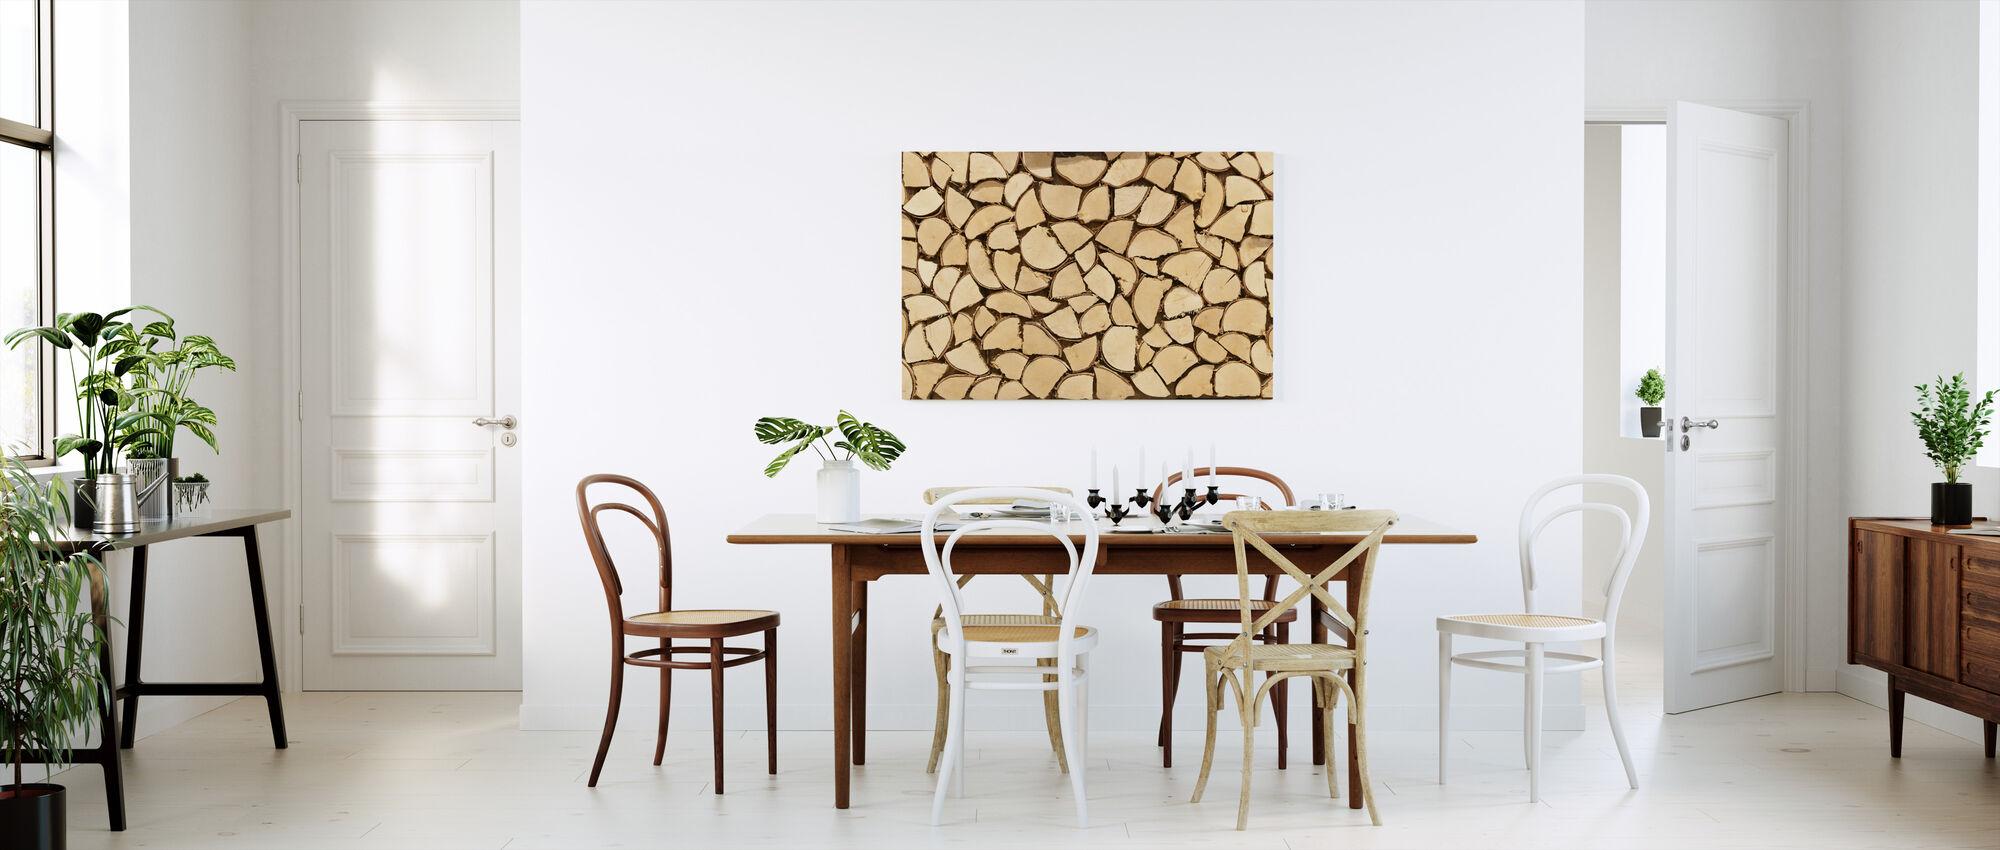 Light Brown Firewood - Canvas print - Kitchen